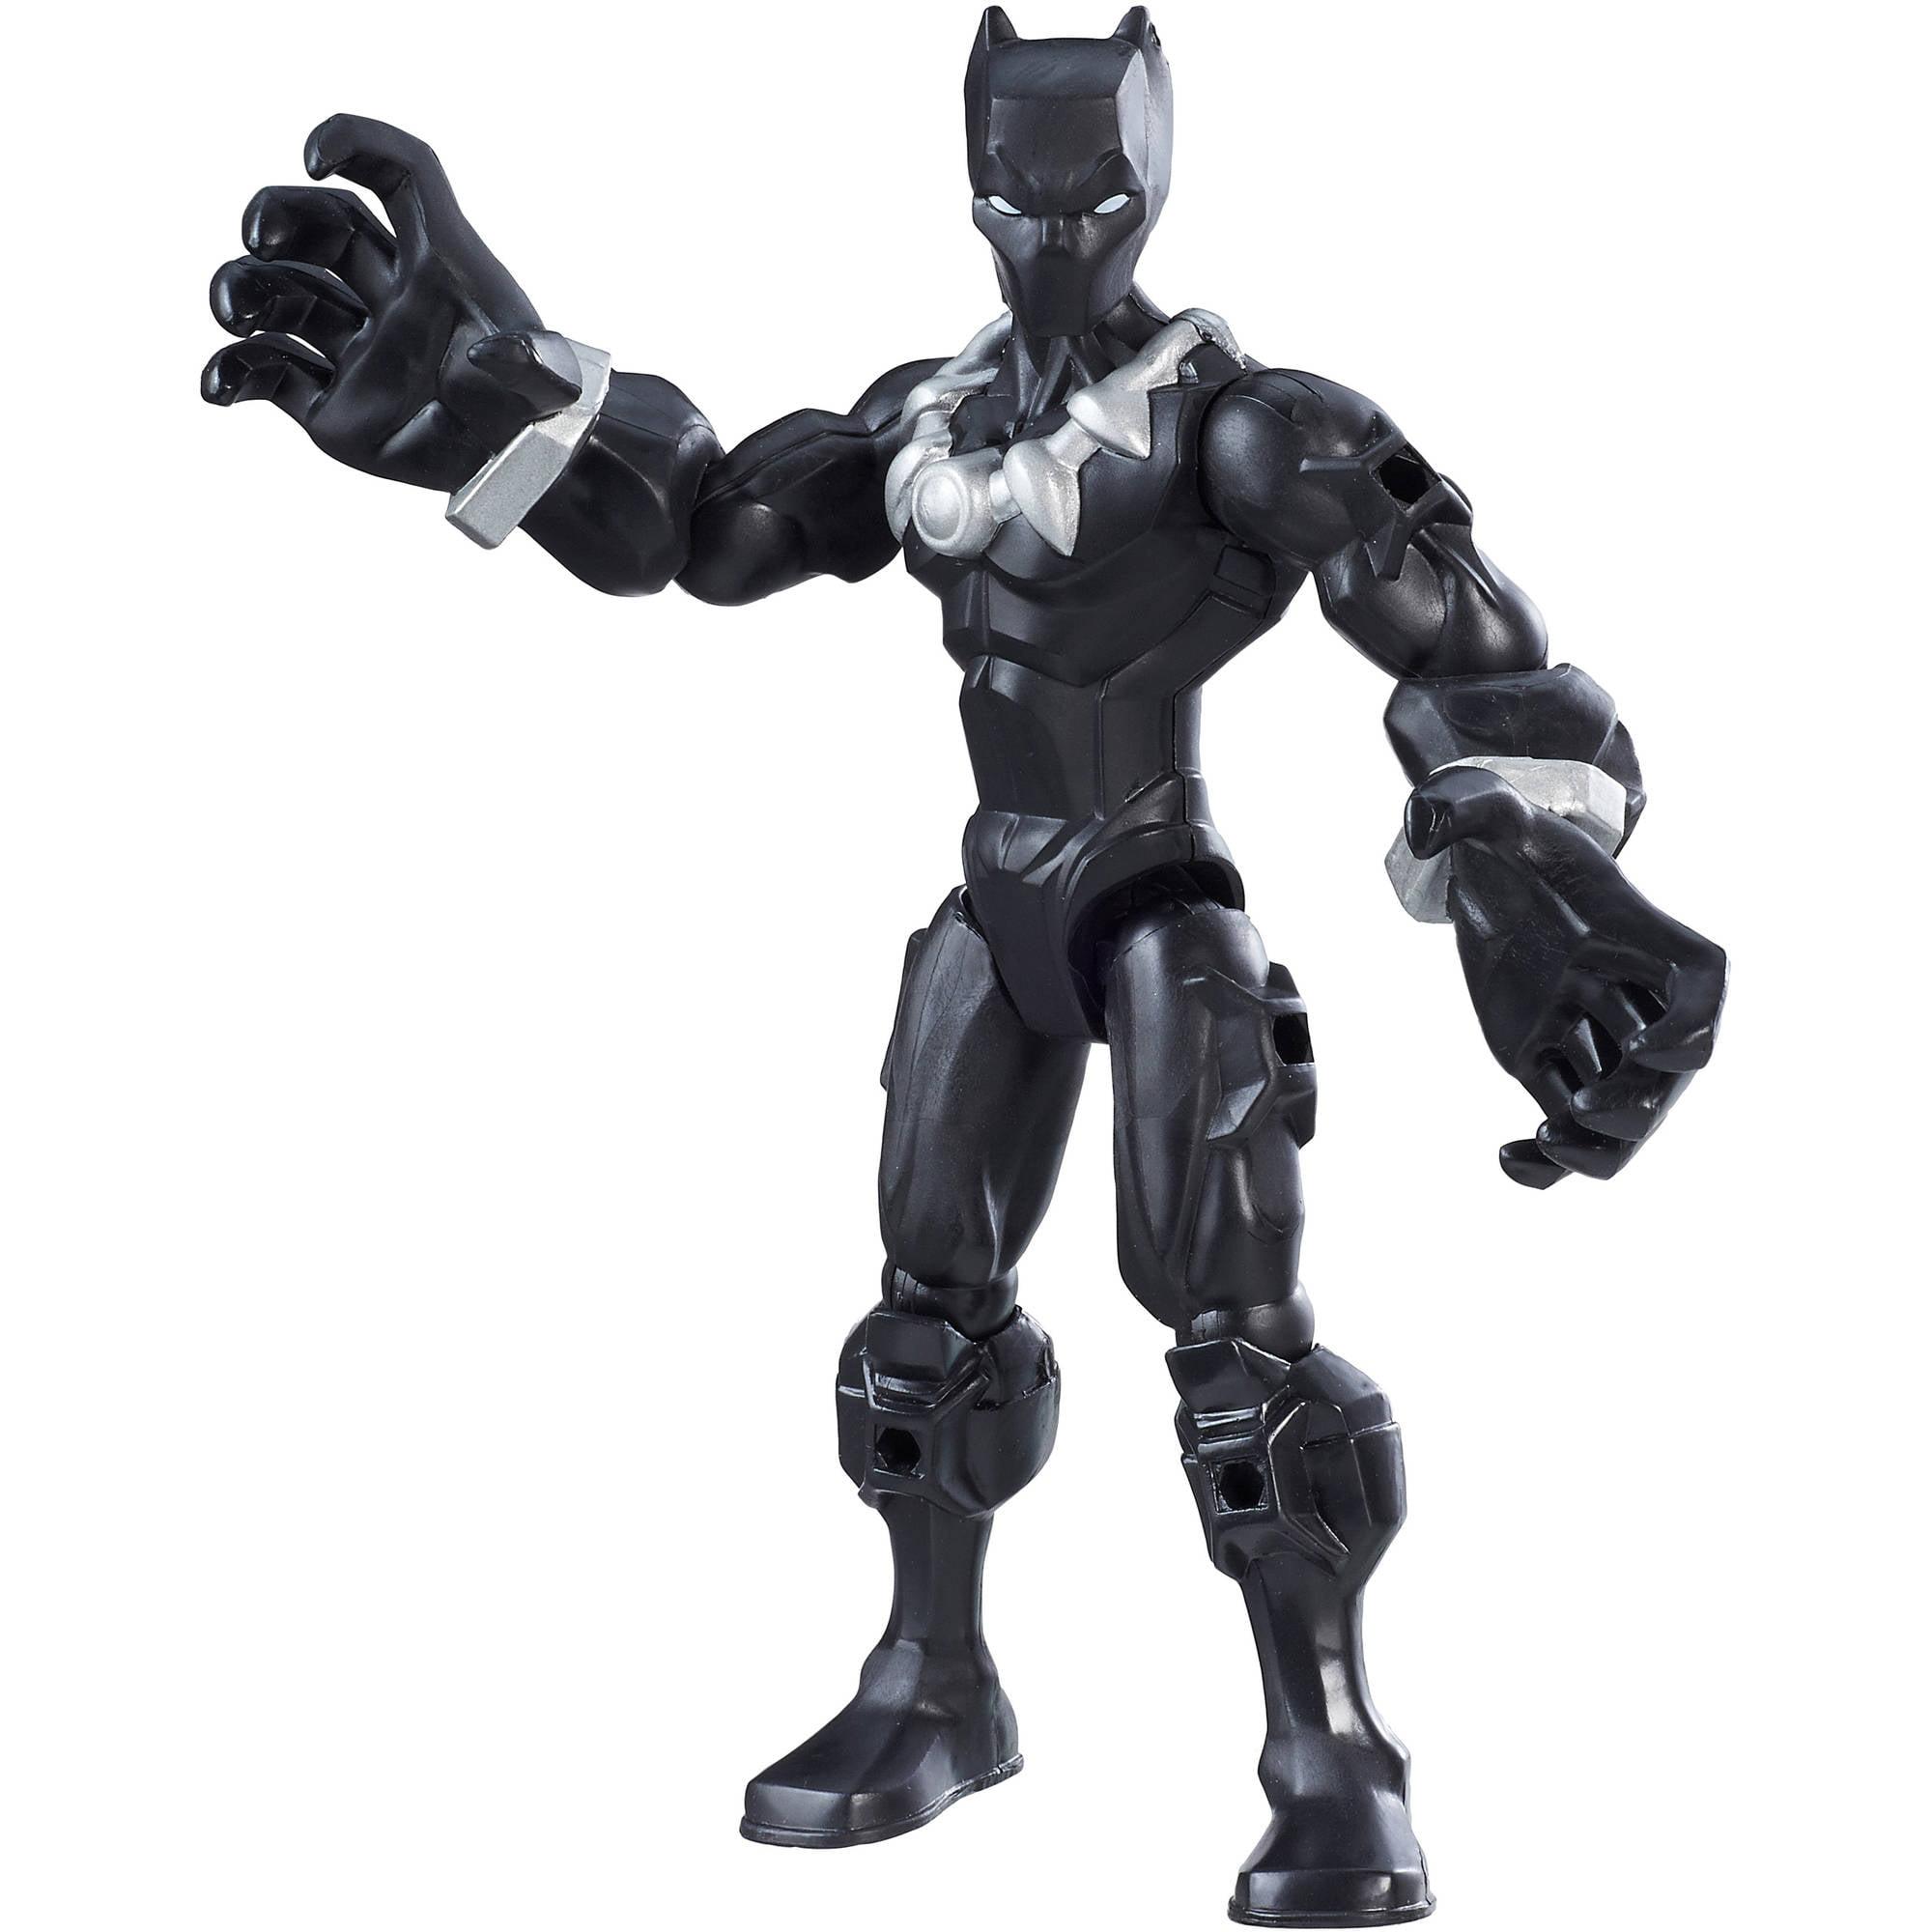 Marvel Super Hero Mashers Black Panther Figure - Walmart.com